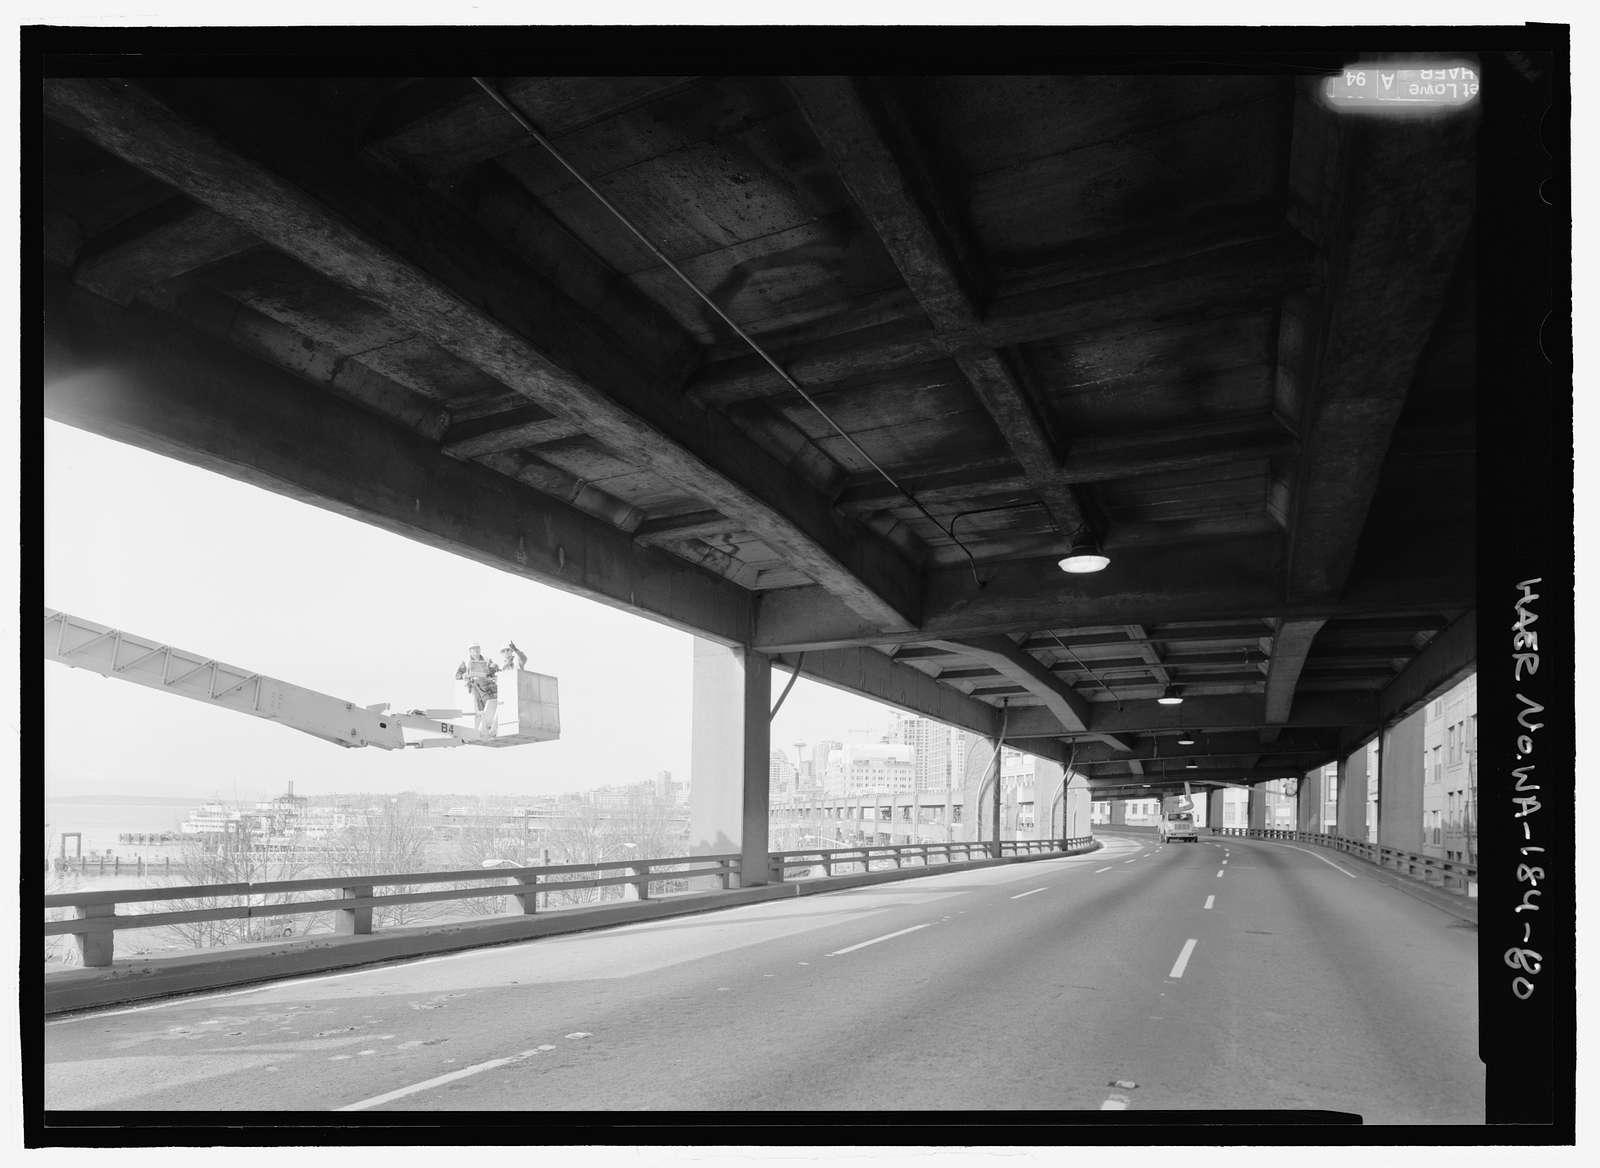 Alaskan Way Viaduct and Battery Street Tunnel, Seattle, King County, WA